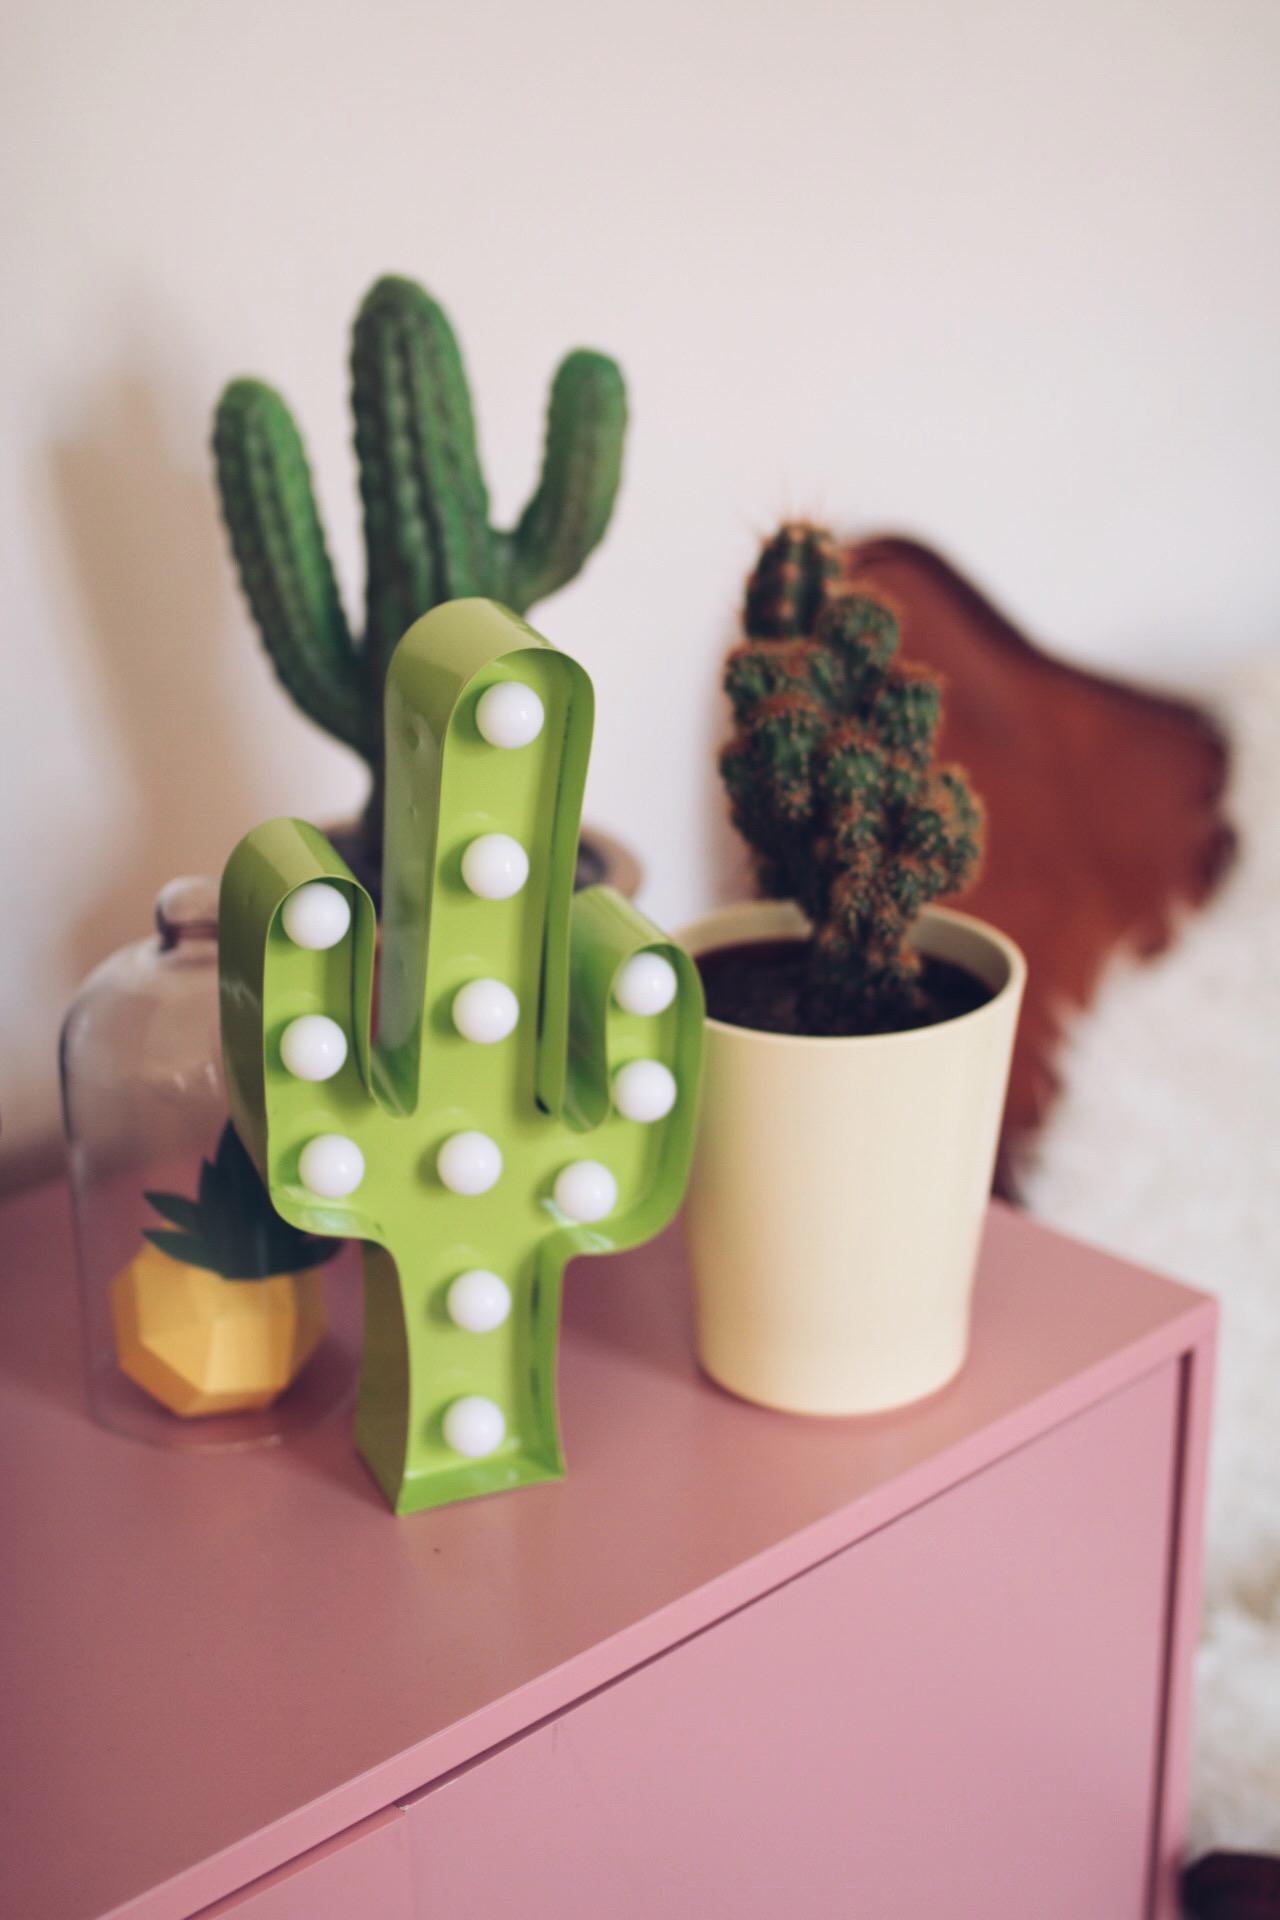 Lampe cactus I Sp4nkblog